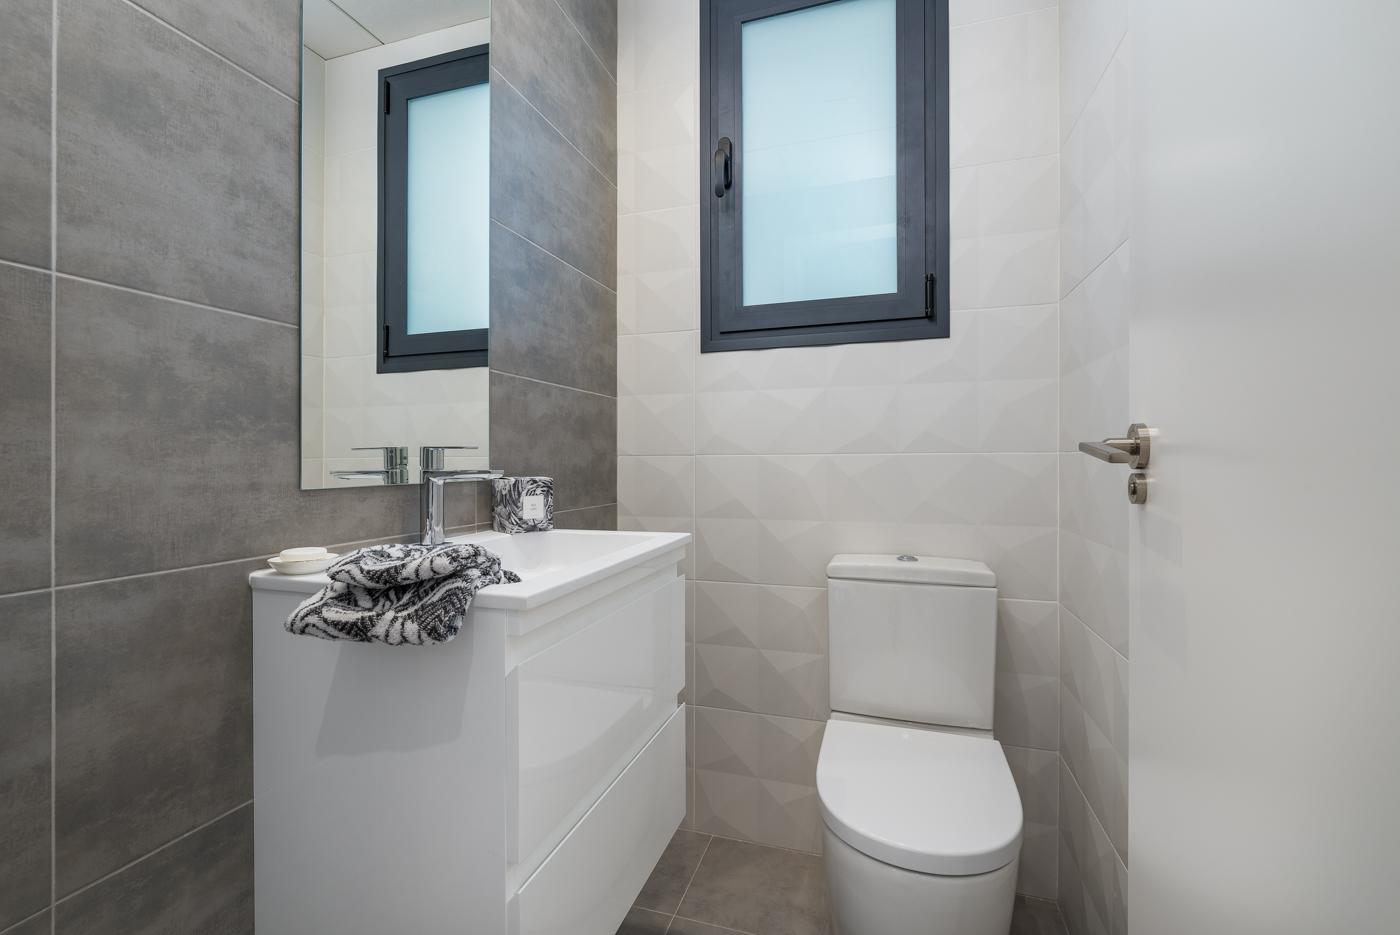 KEY READY New Build Villas With a Private Pool in Dolores, Alicante